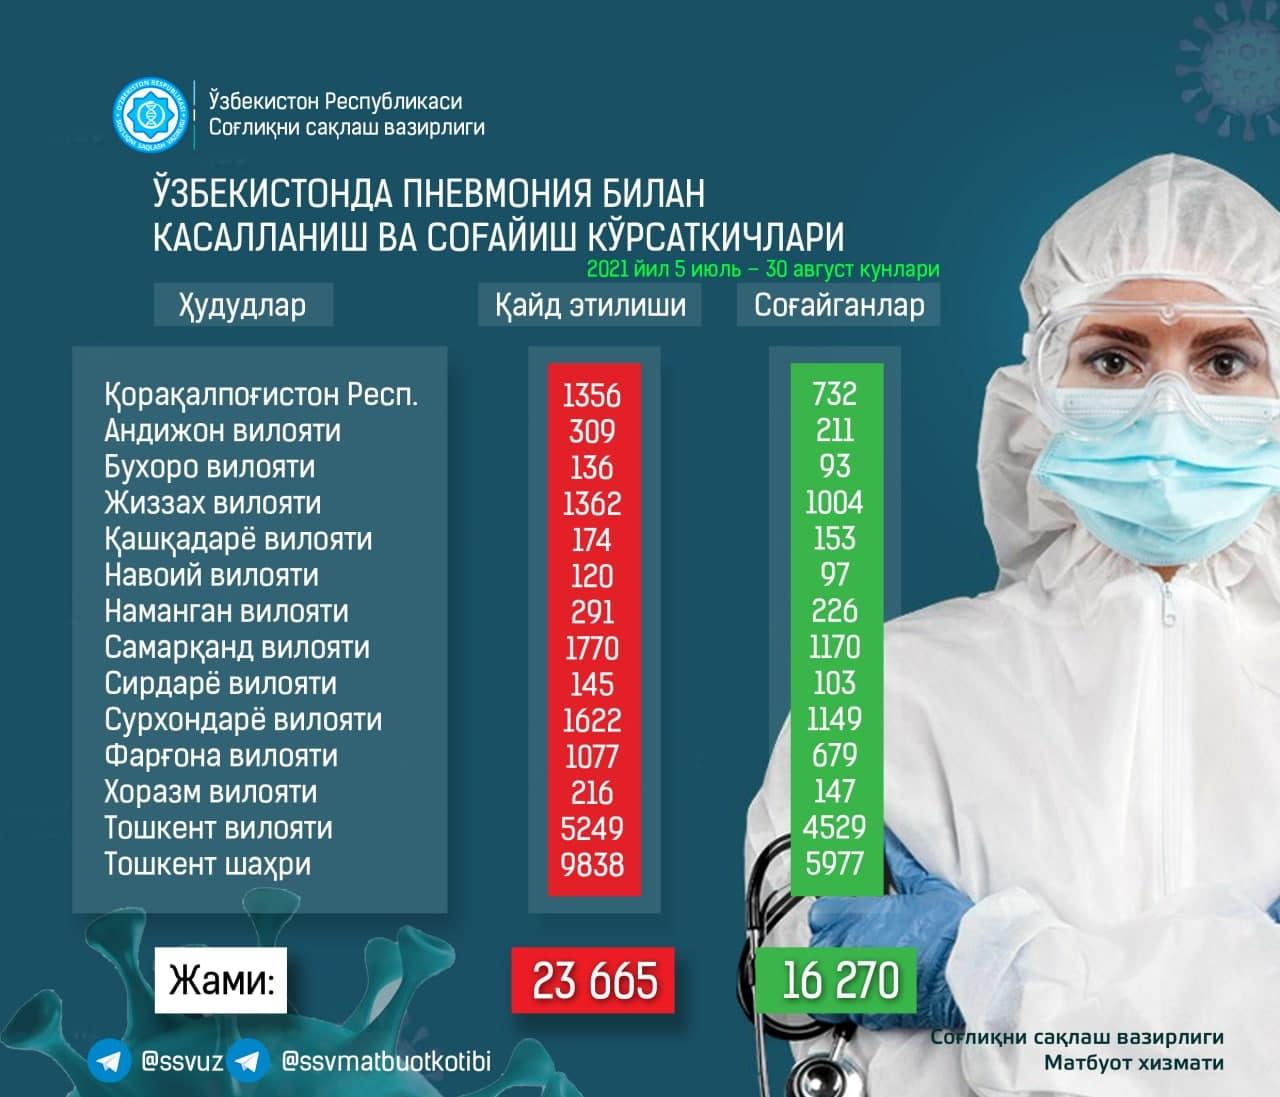 За сутки более 200 человек заболело пневмонией — статистика